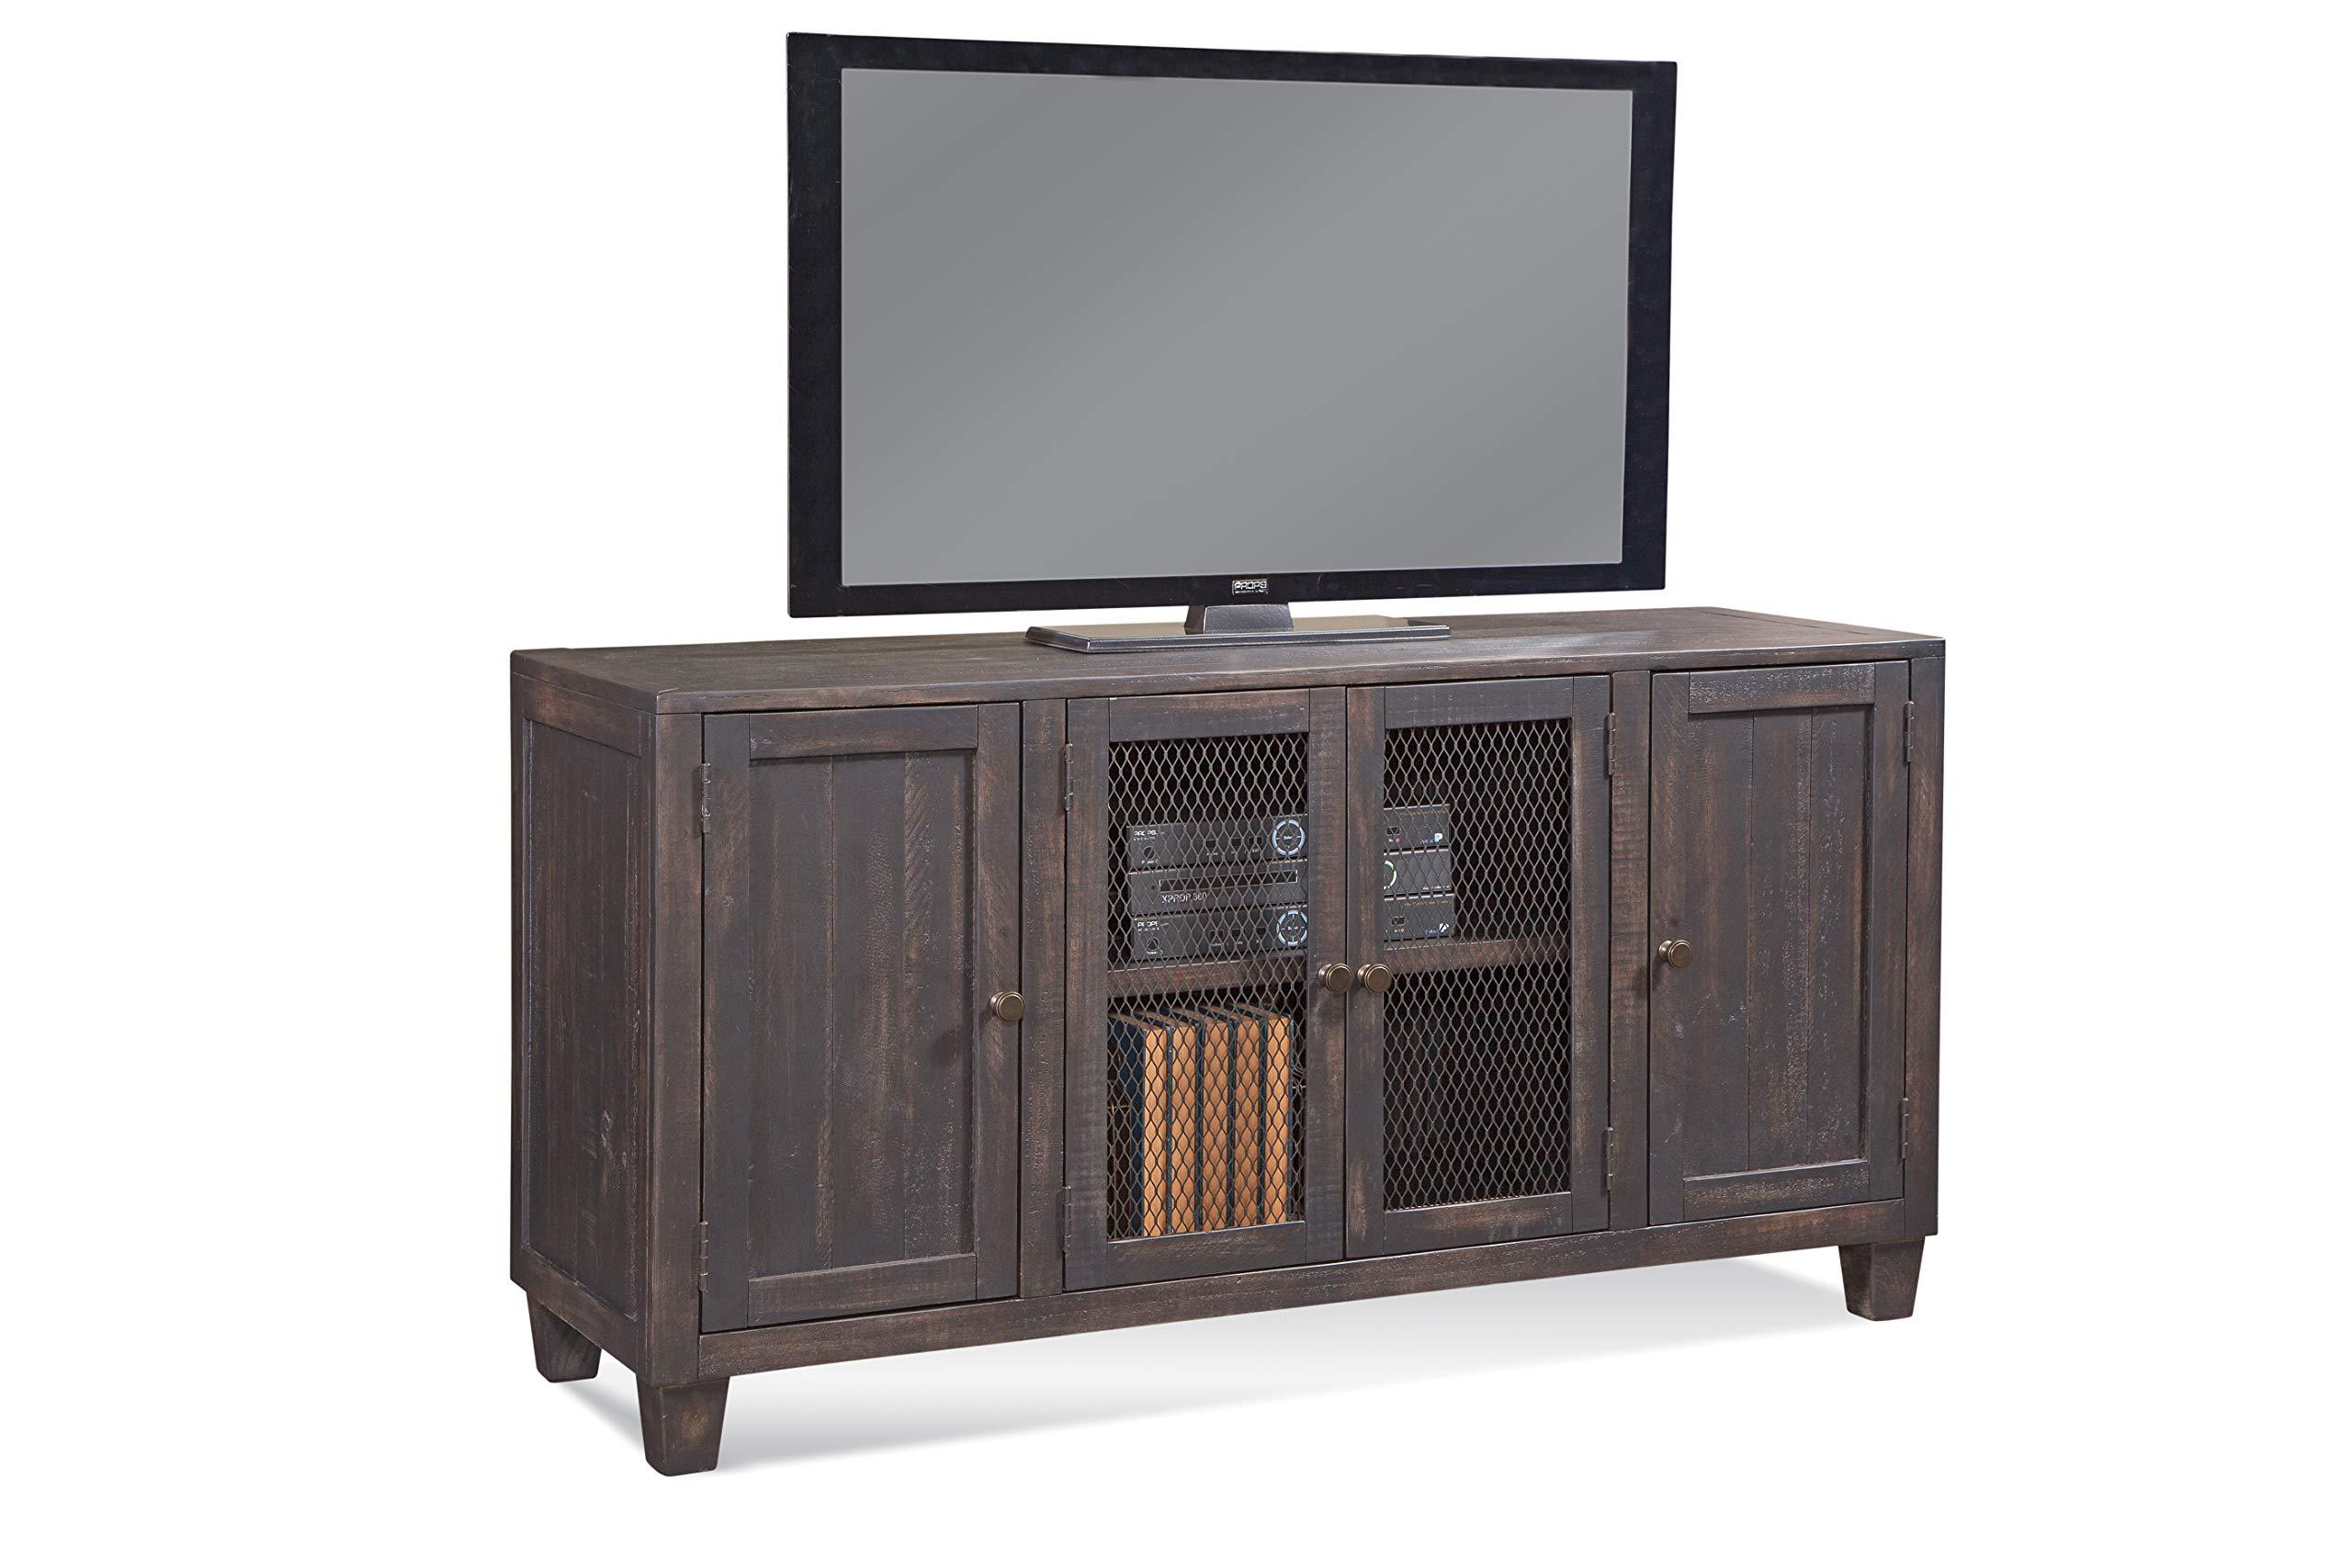 Smal Tv Meubel.Amazon Com Mecor Modern White Tv Stand With Led Lights High